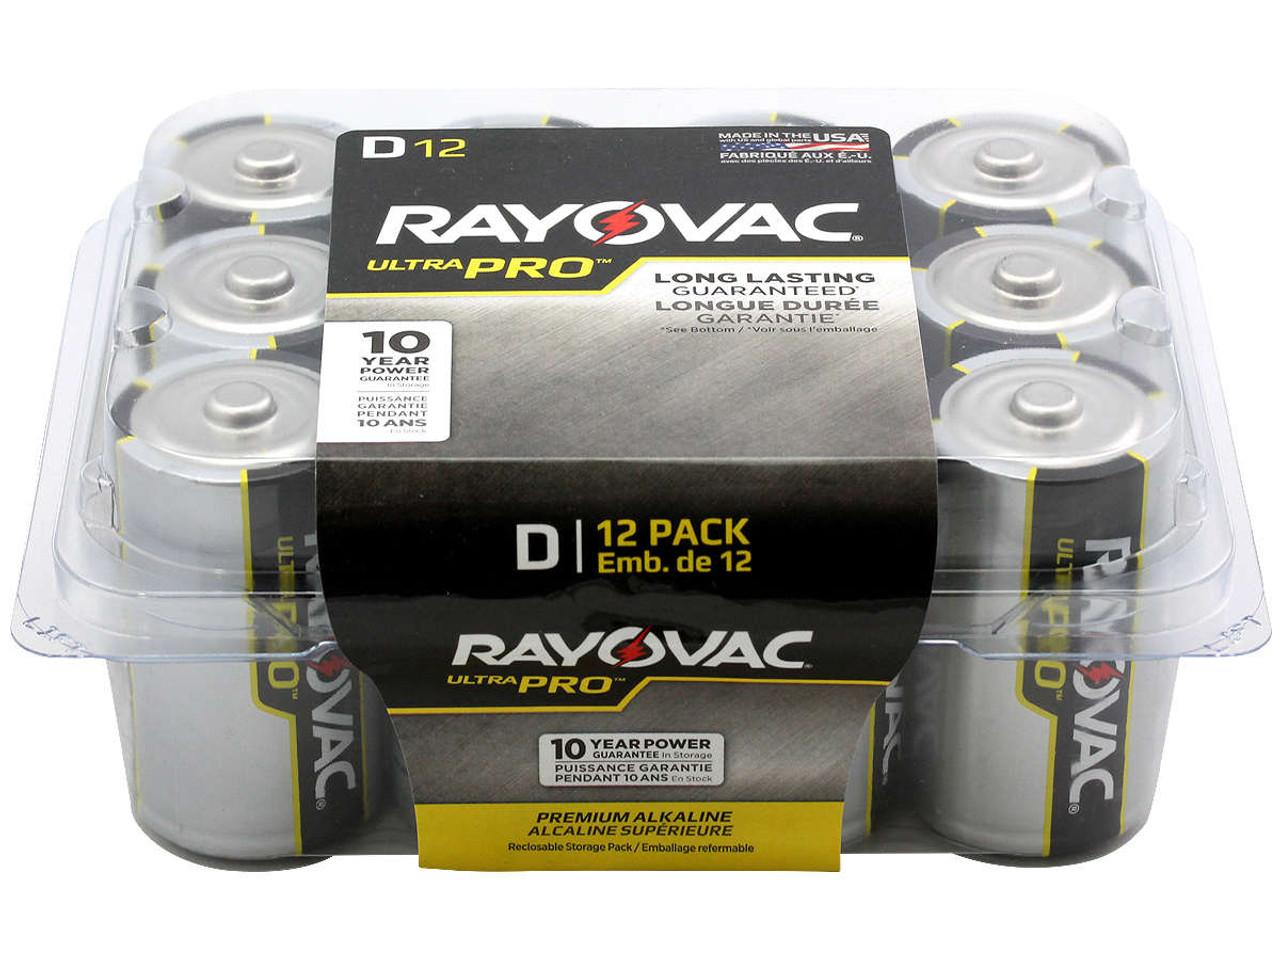 Rayovac Ultra Pro AL-D-12 Alkaline Button Top Batteries - 12 Pack (ALD-12PPJ)